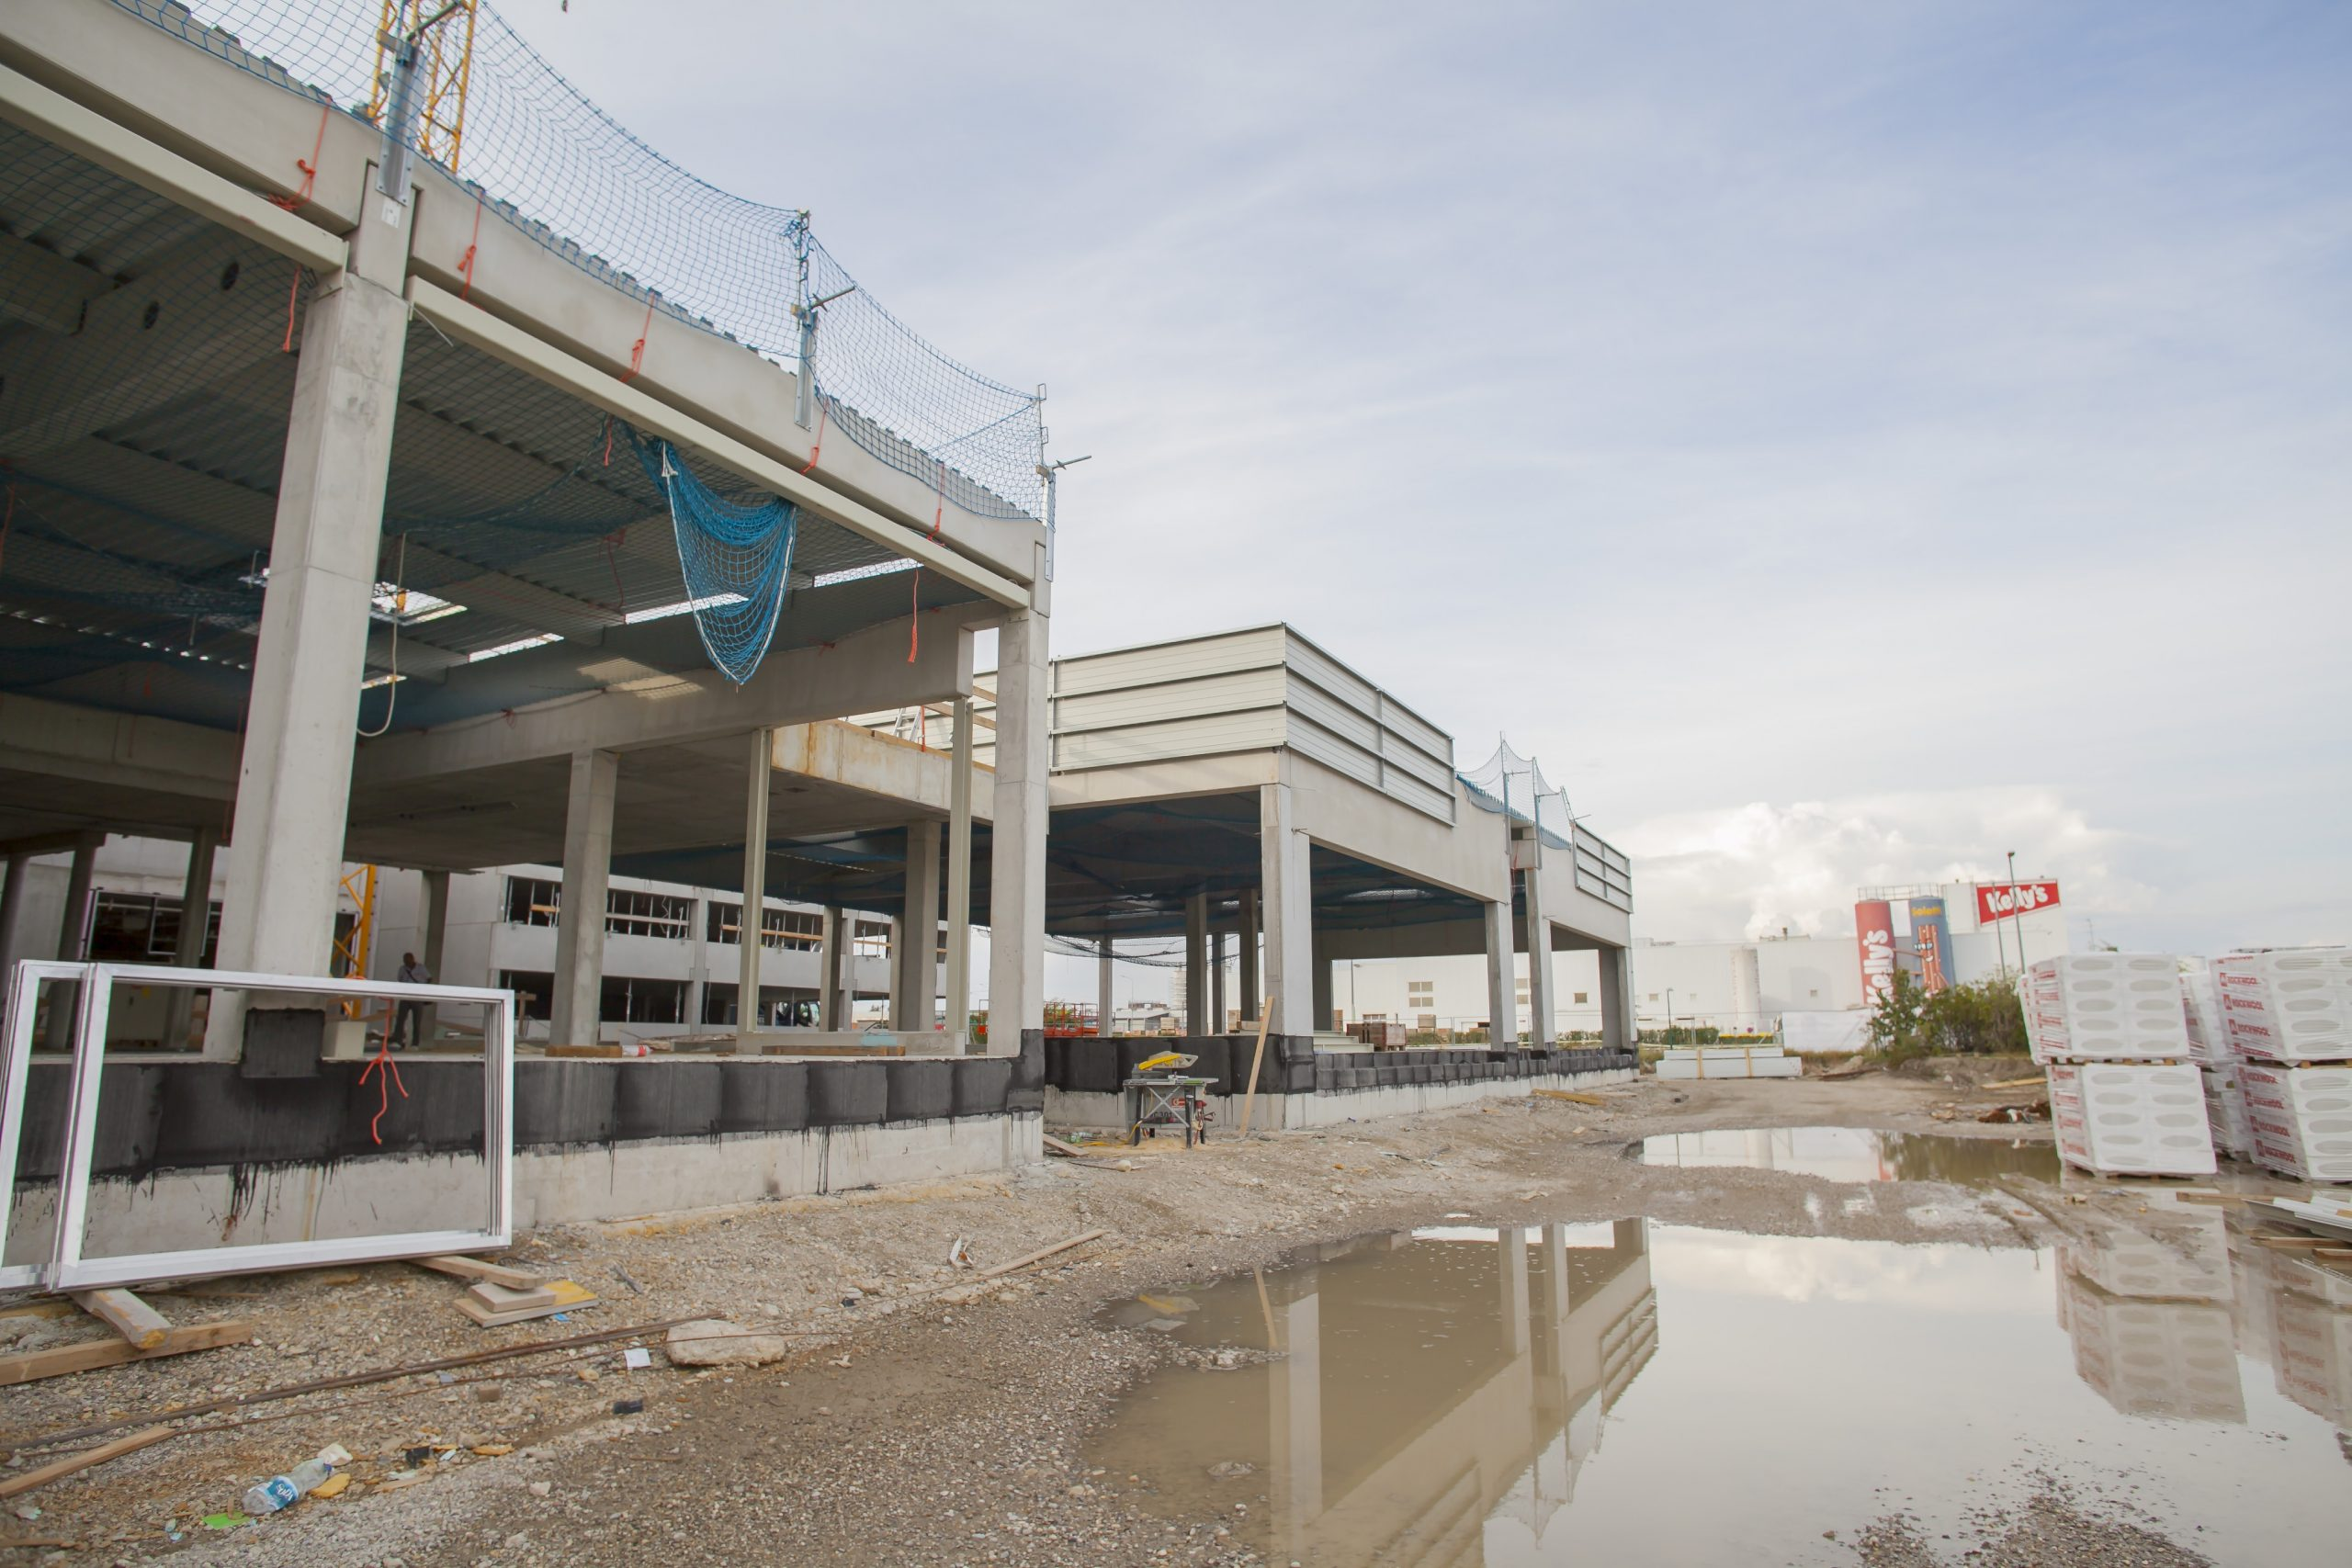 AUTO STAHL Wien 22 | Baufortschritt | September 2020